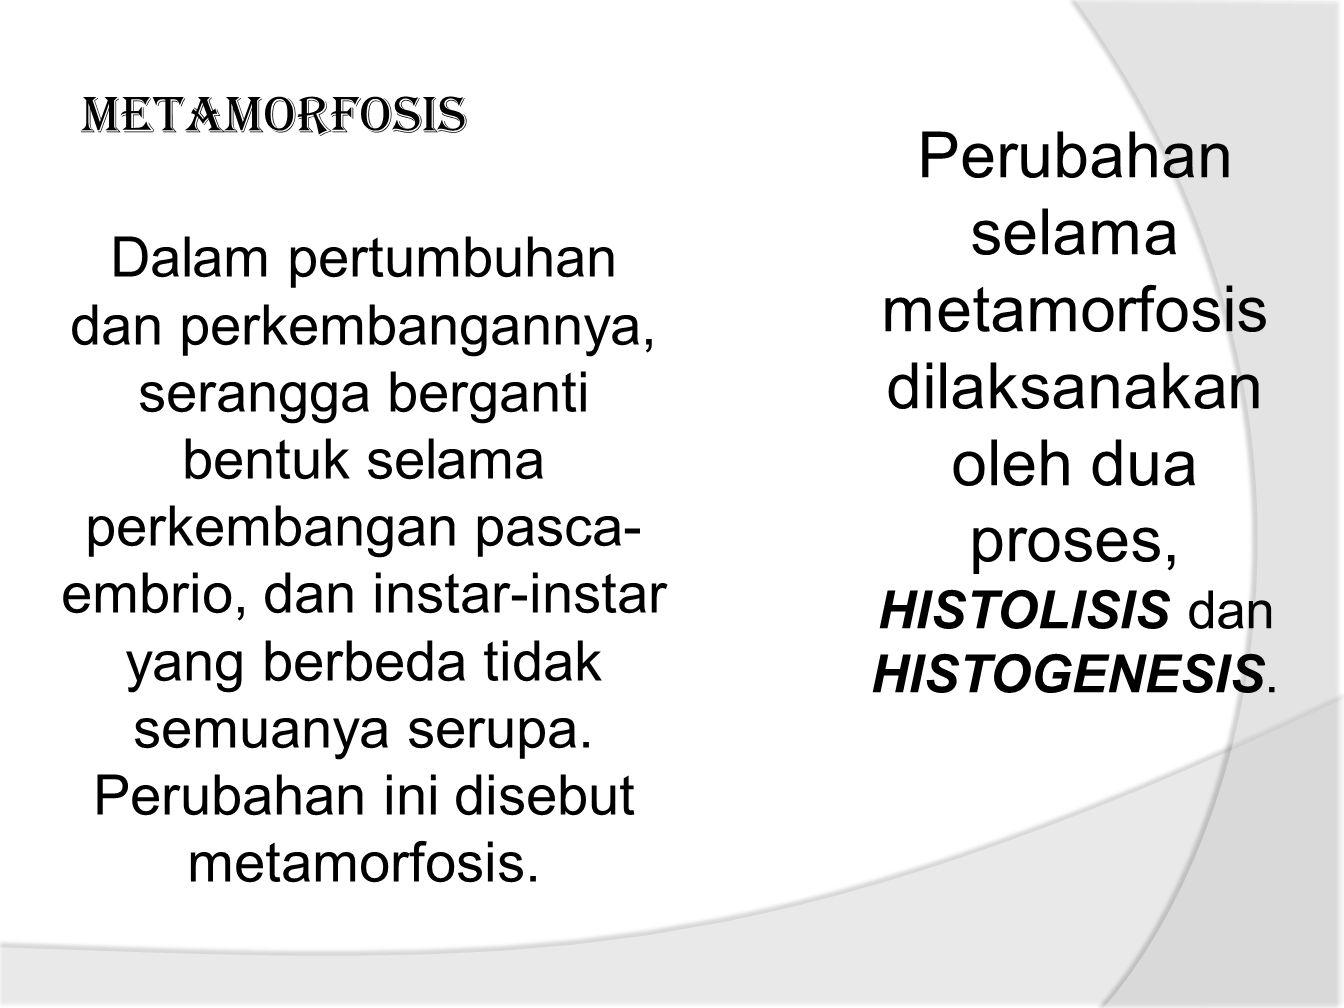 METAMORFOSIS Dalam pertumbuhan dan perkembangannya, serangga berganti bentuk selama perkembangan pasca- embrio, dan instar-instar yang berbeda tidak semuanya serupa.